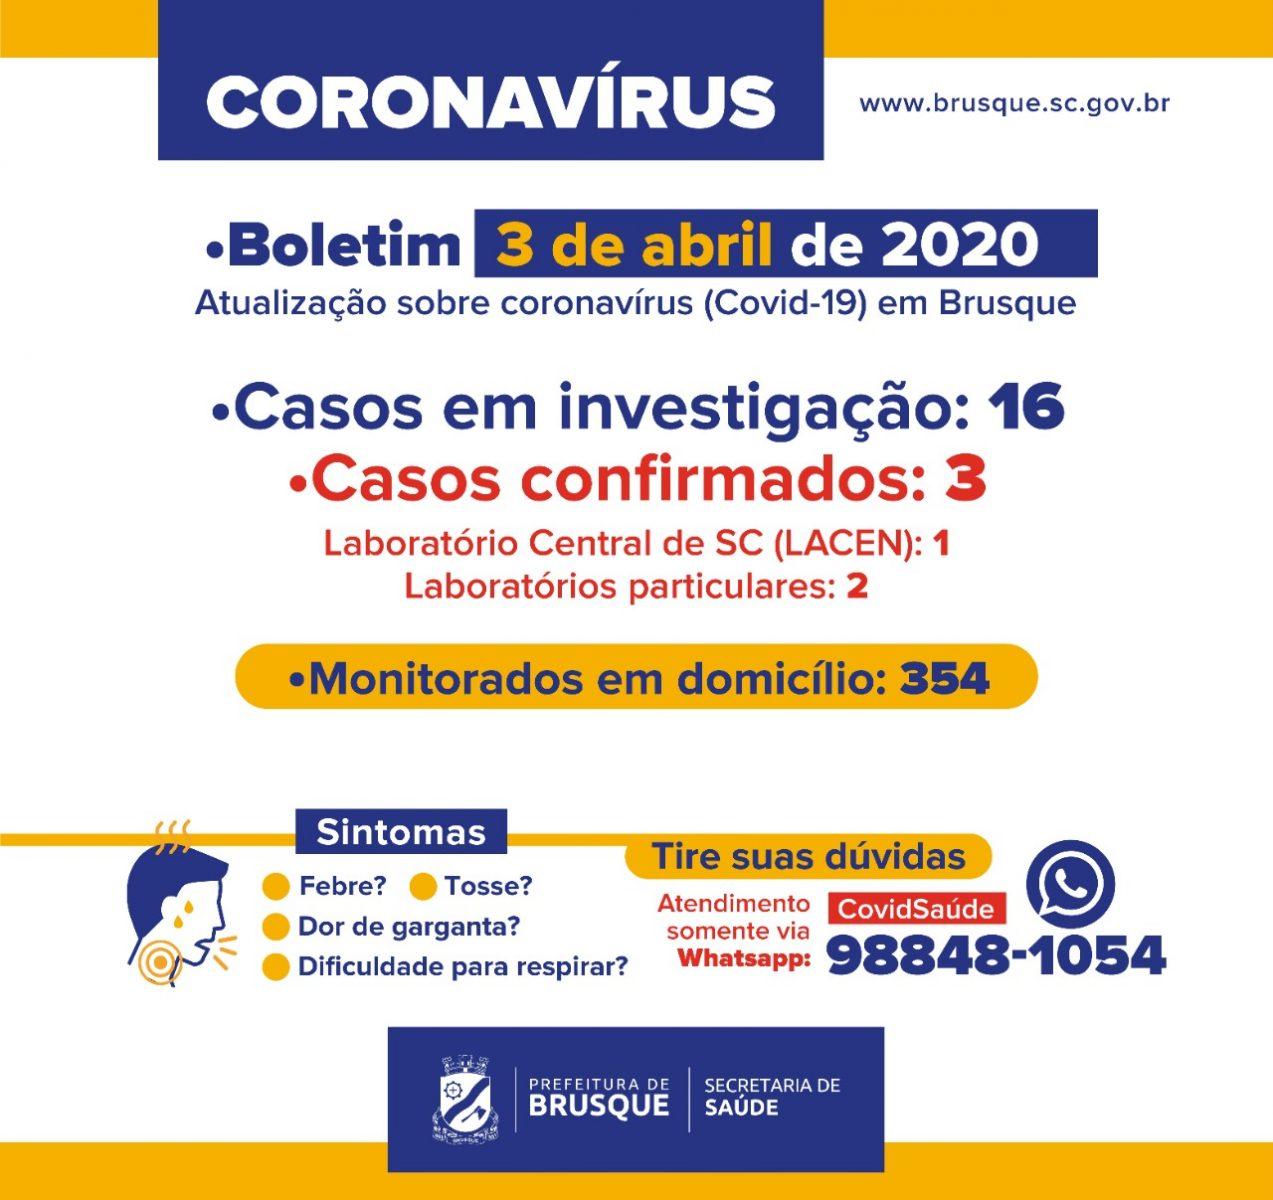 Confira o Boletim Epidemiológico da Prefeitura de Brusque desta sexta-feira (03)